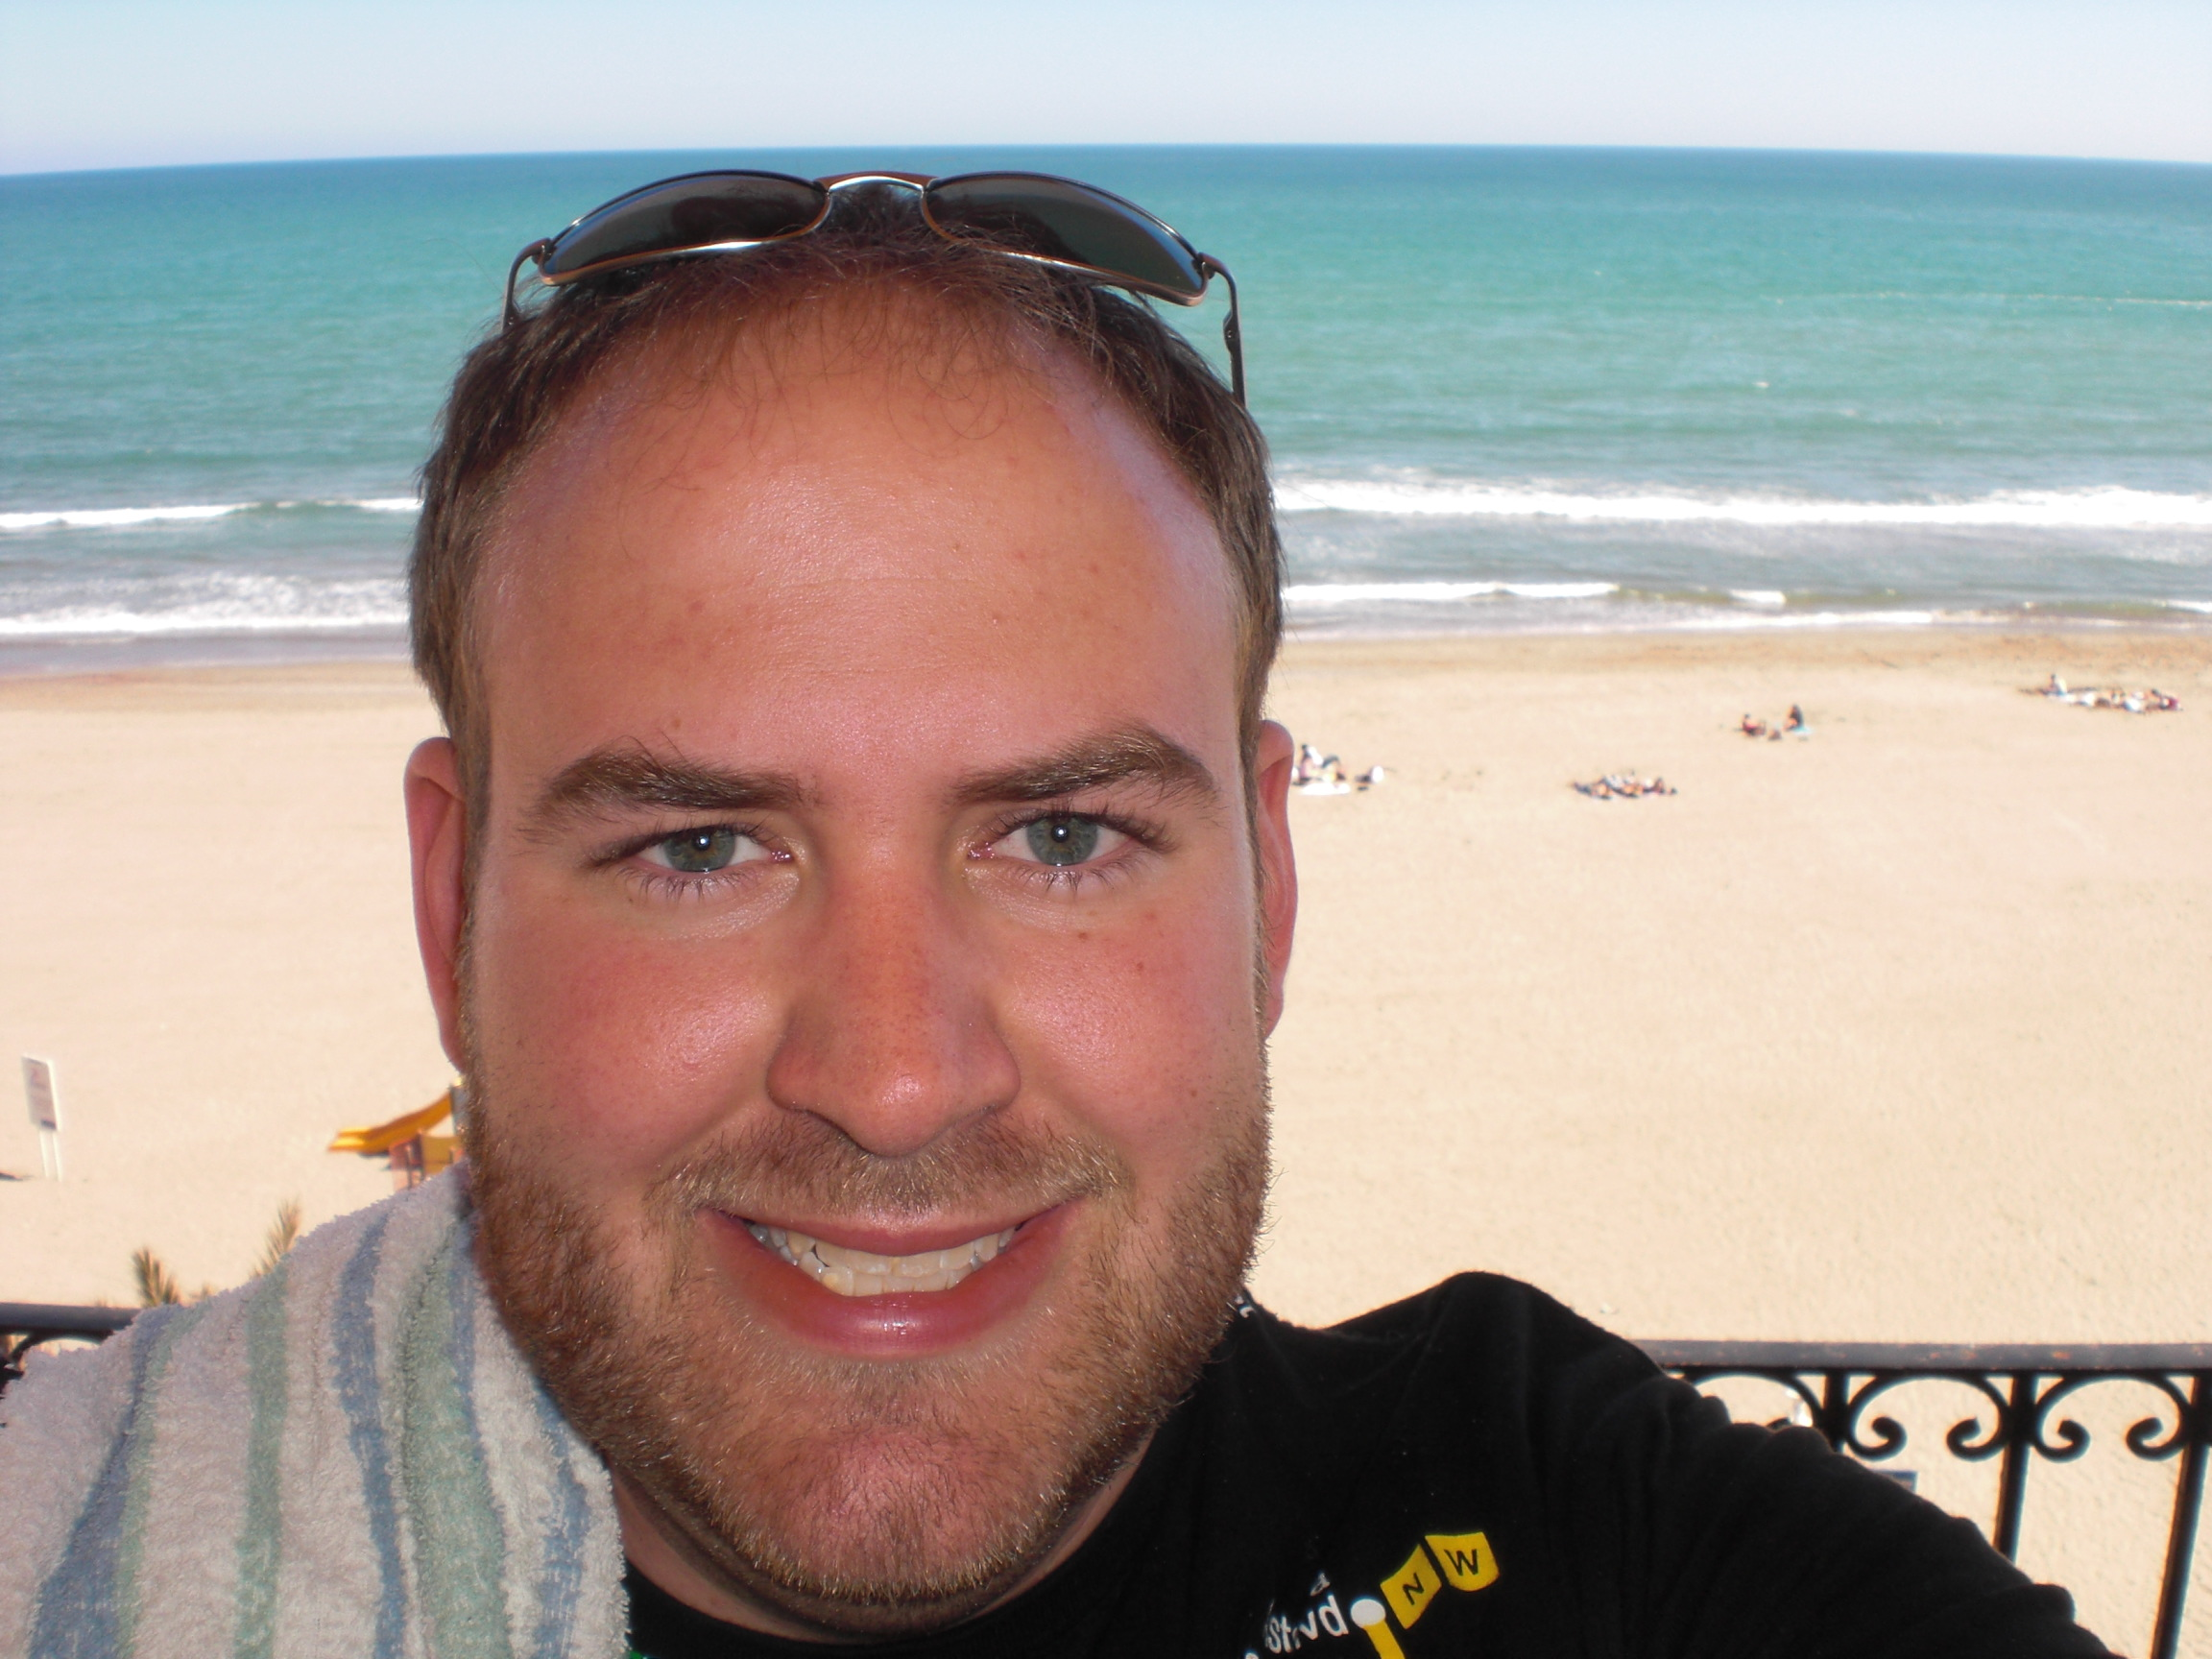 Me on the Balcony!